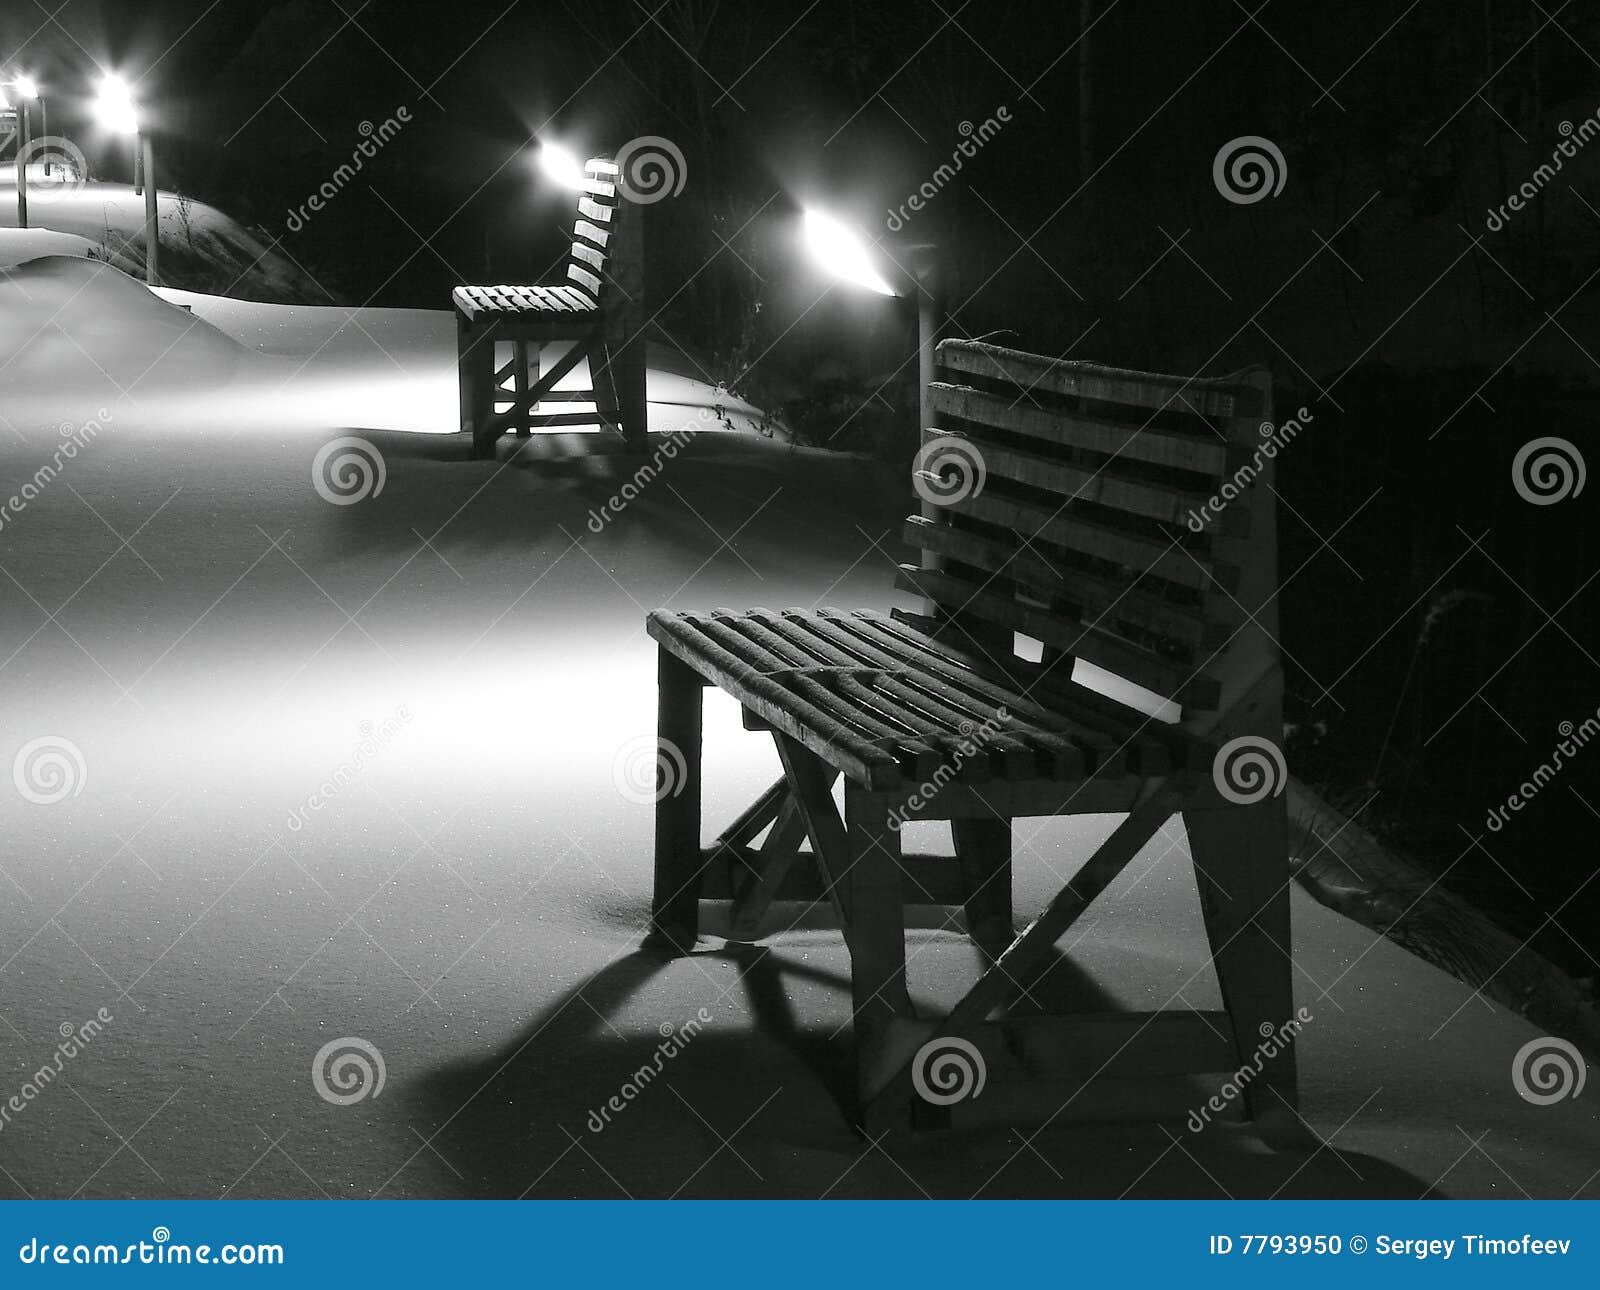 night public